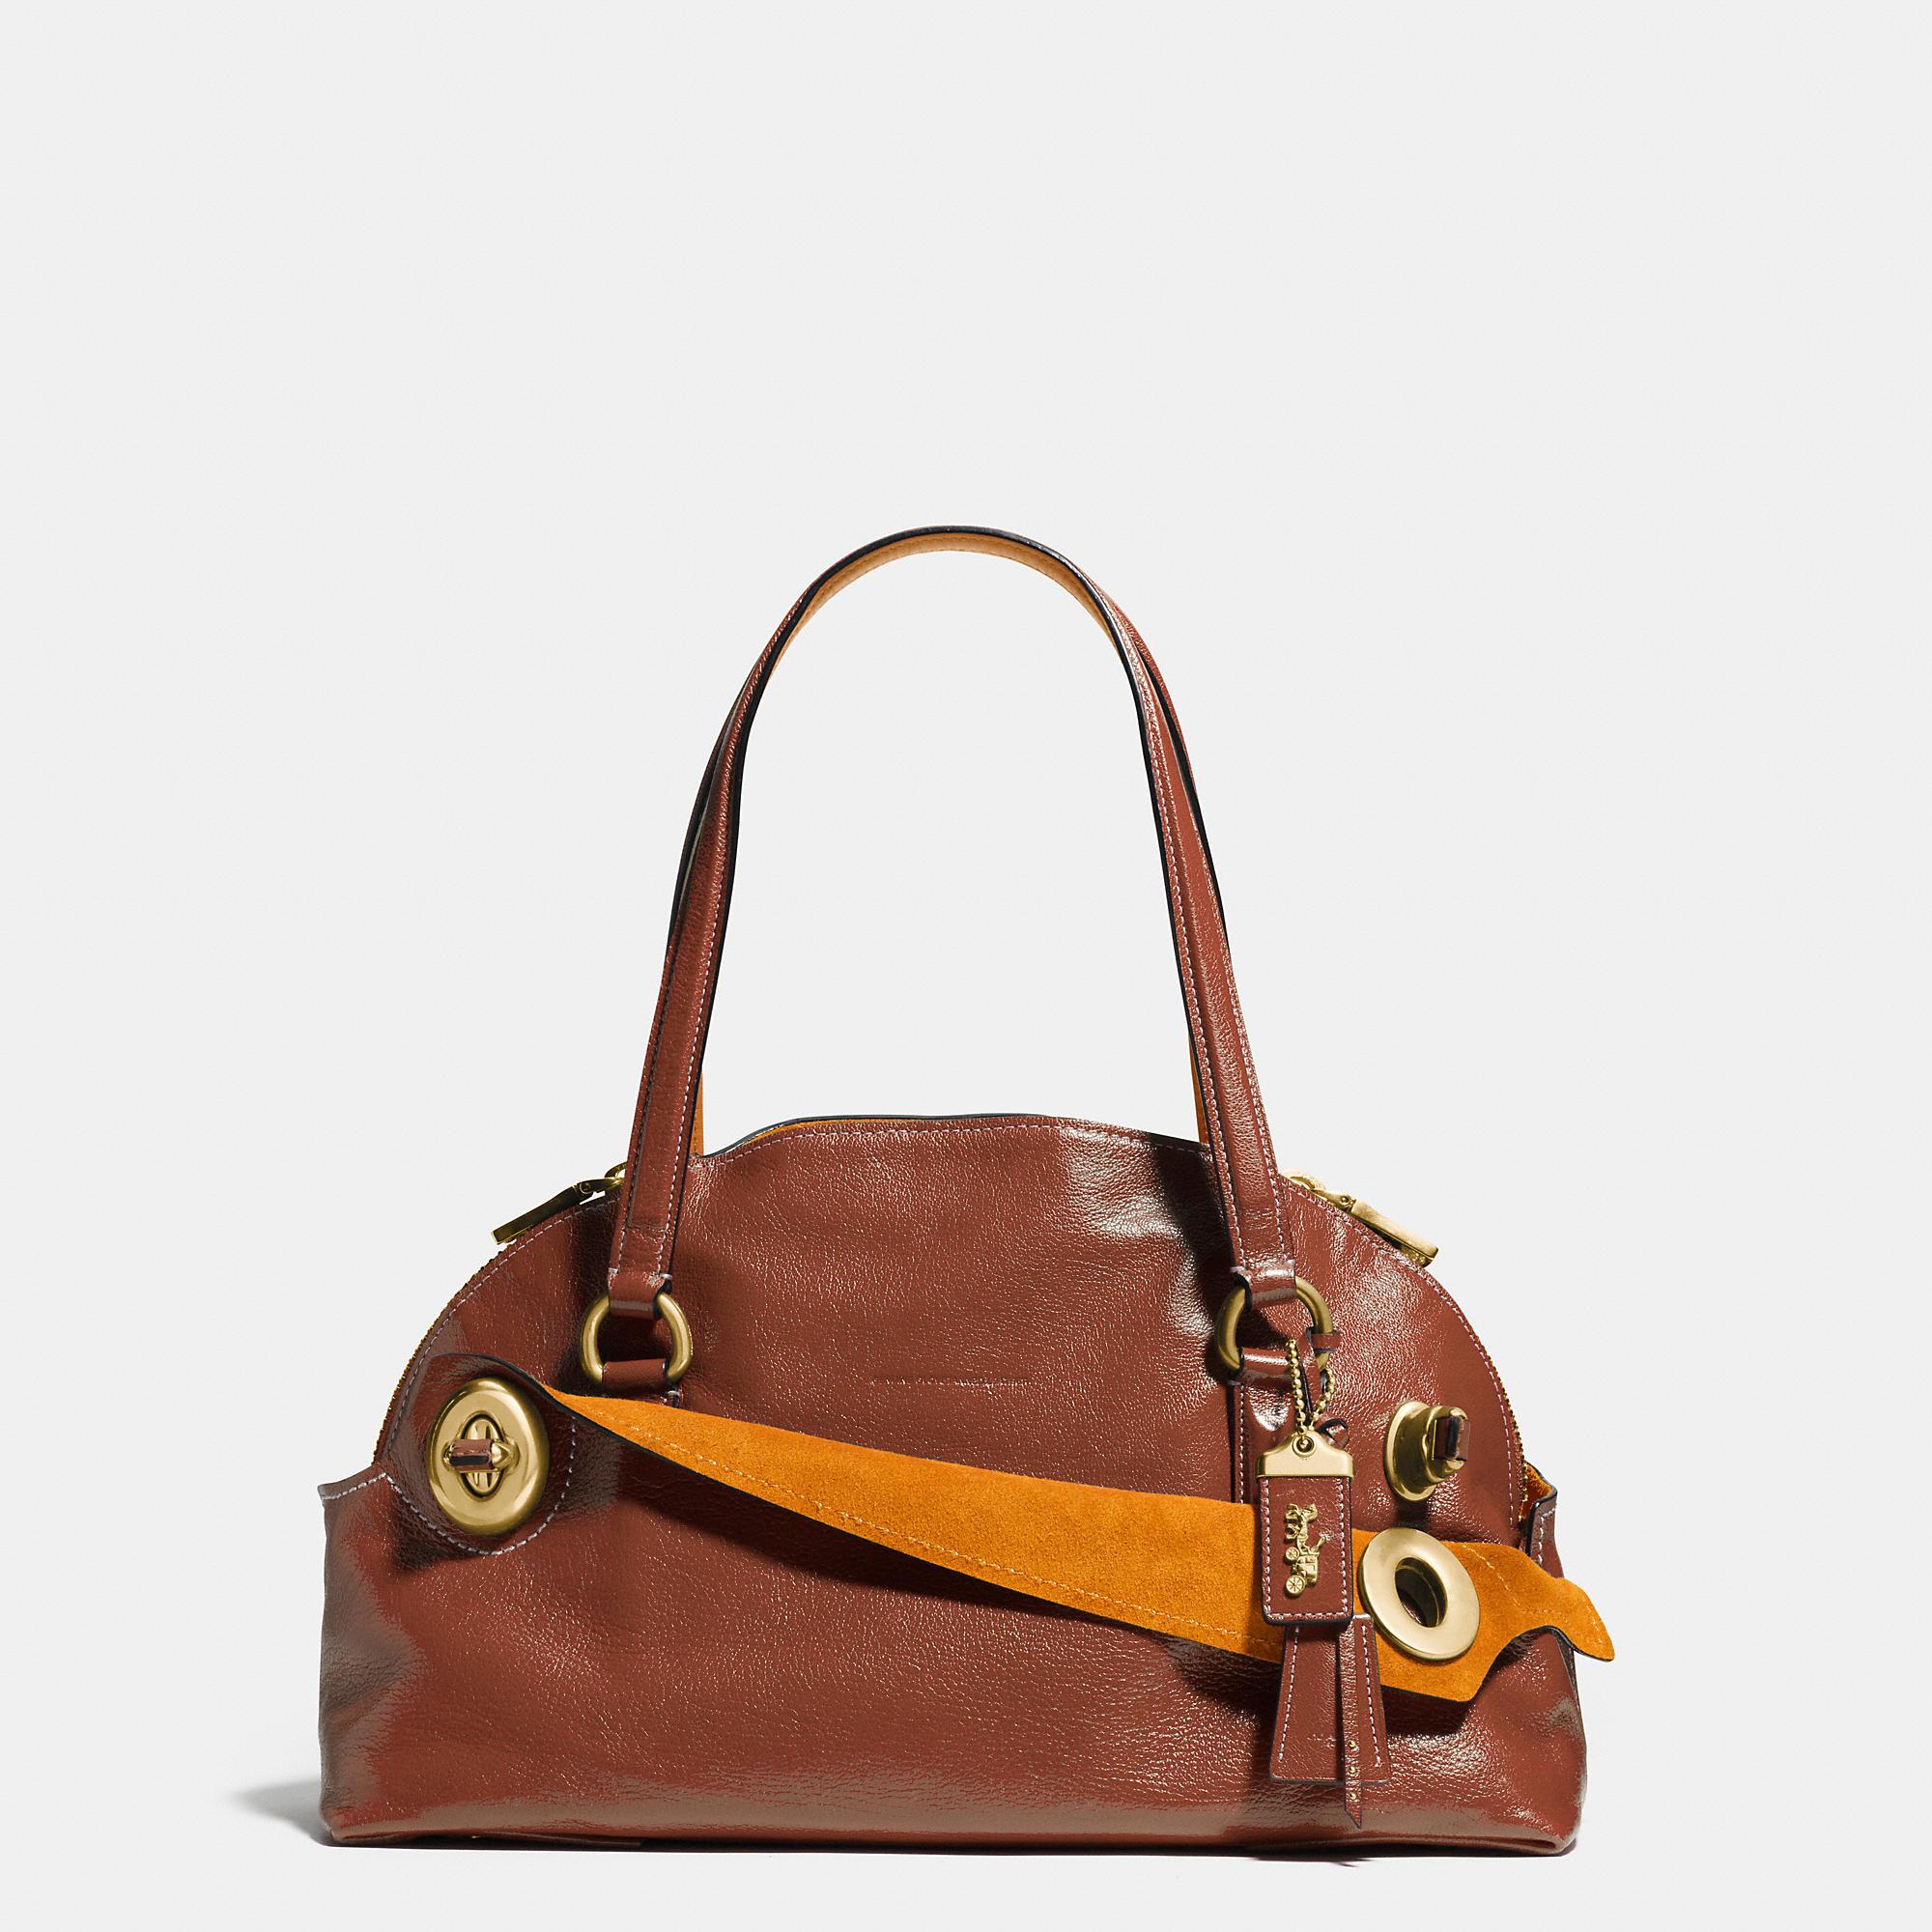 australia coach totes handbags jewelry luggage 0a1a1 4e594 rh gccalifornia com